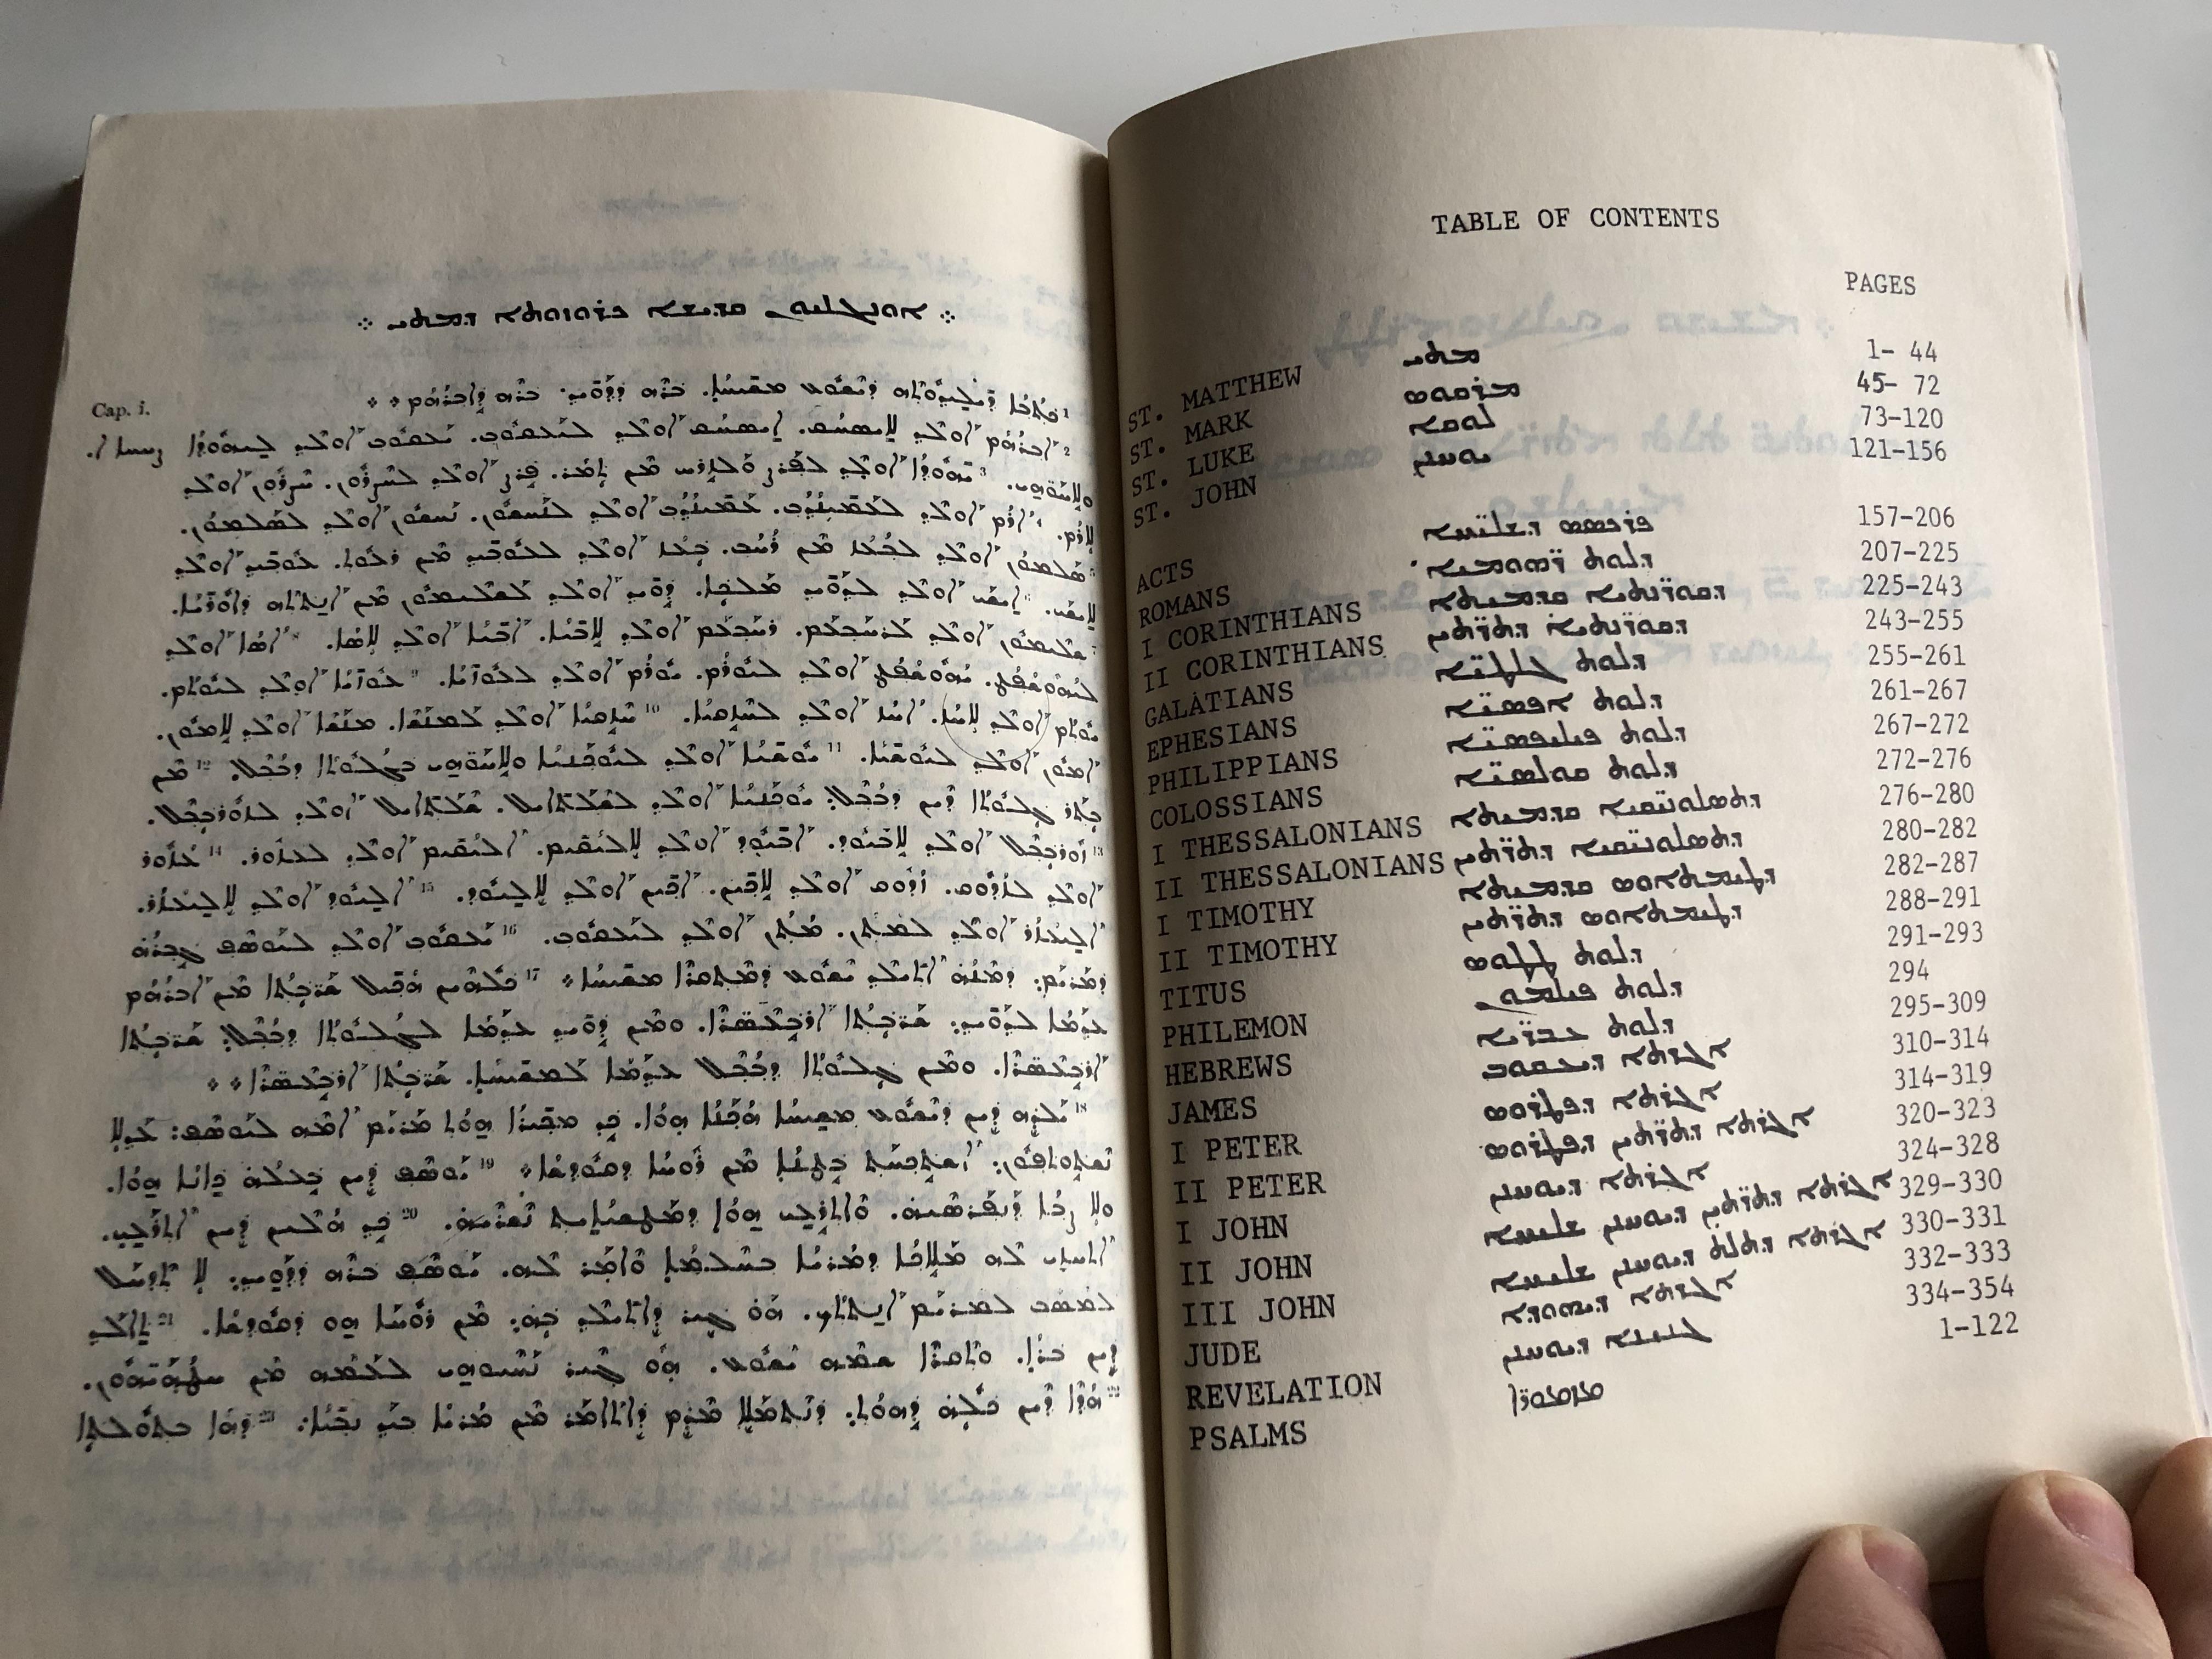 syriac-new-testament-and-psalms-ubs-epf-1998-pshitto-nt-5-.jpg